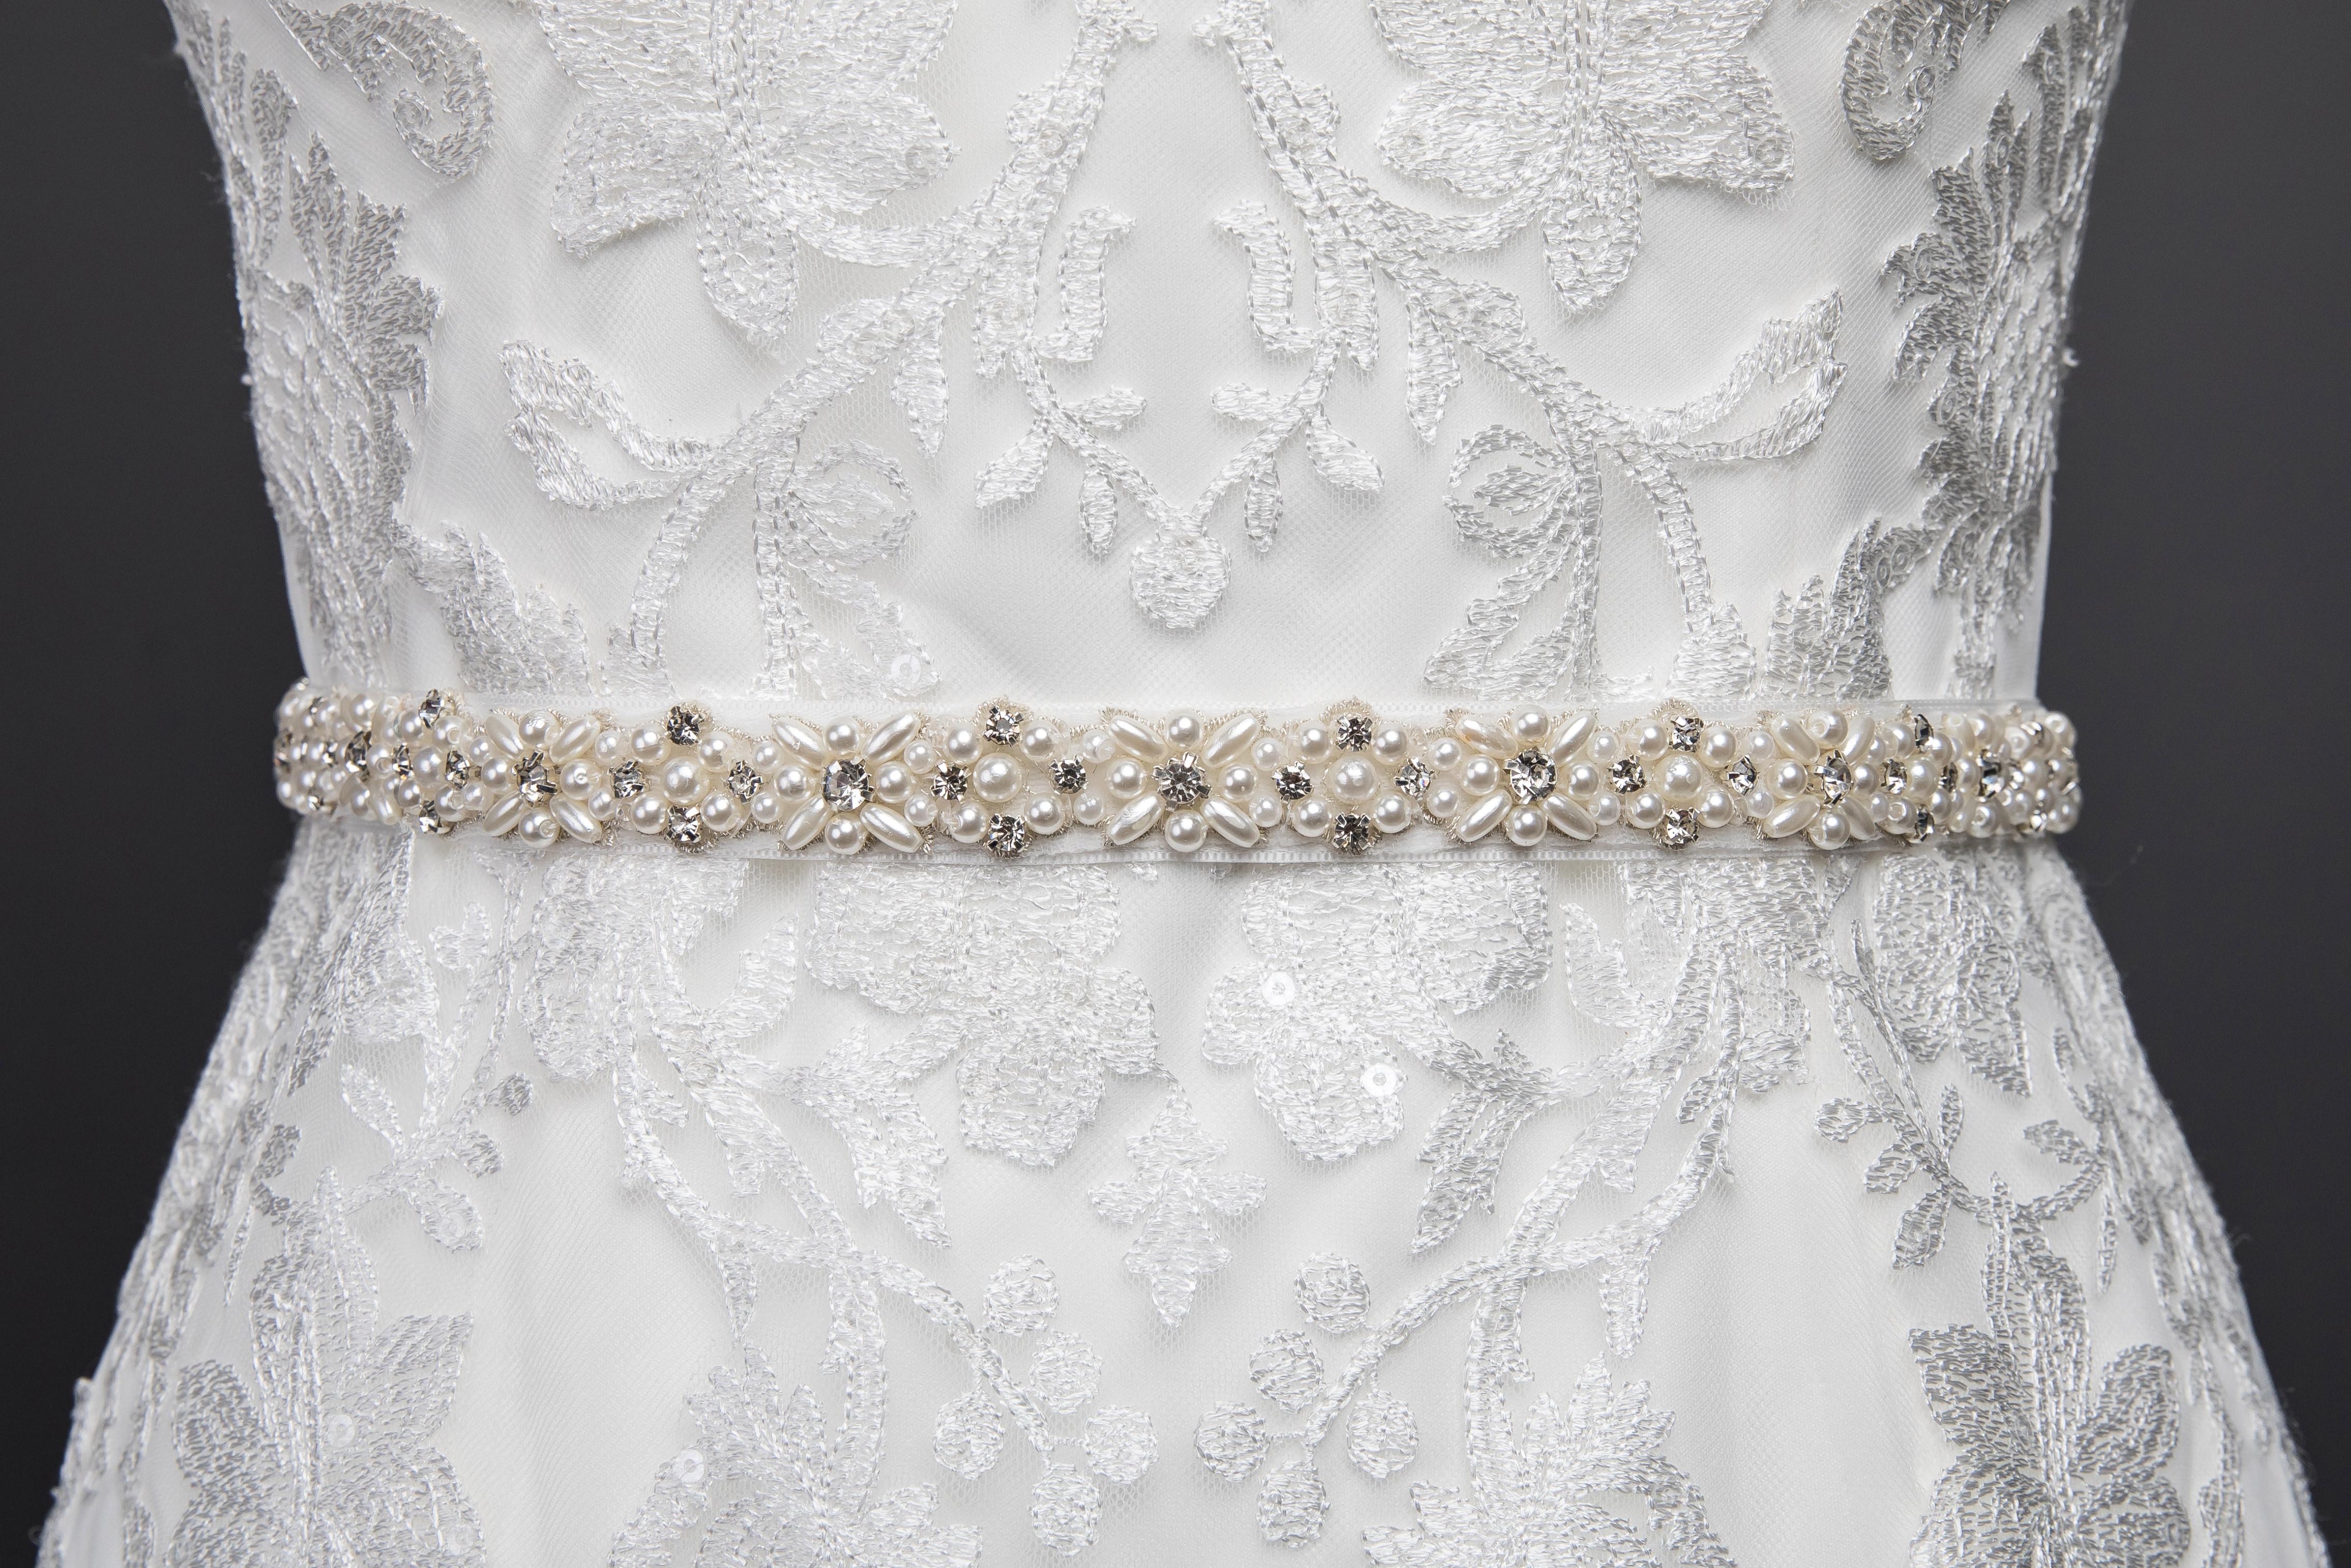 Bridal Classics Belts & Gown Jewellery BELT-61